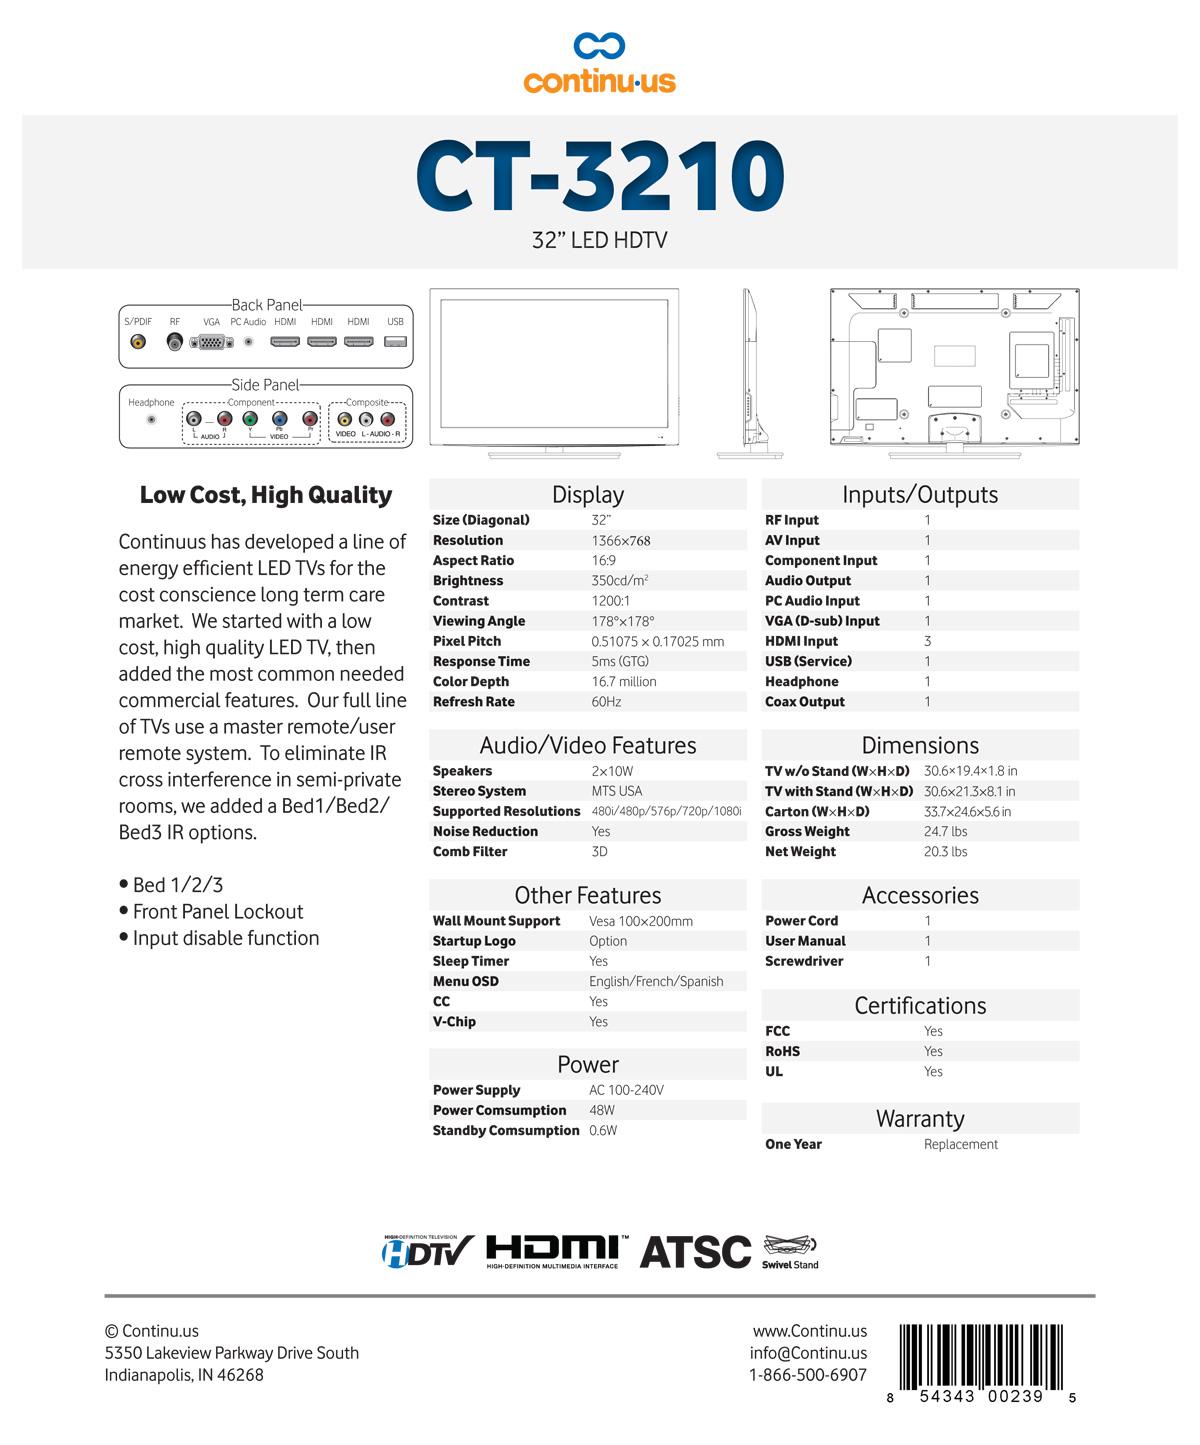 Continu.us CT3210 Spec Sheet